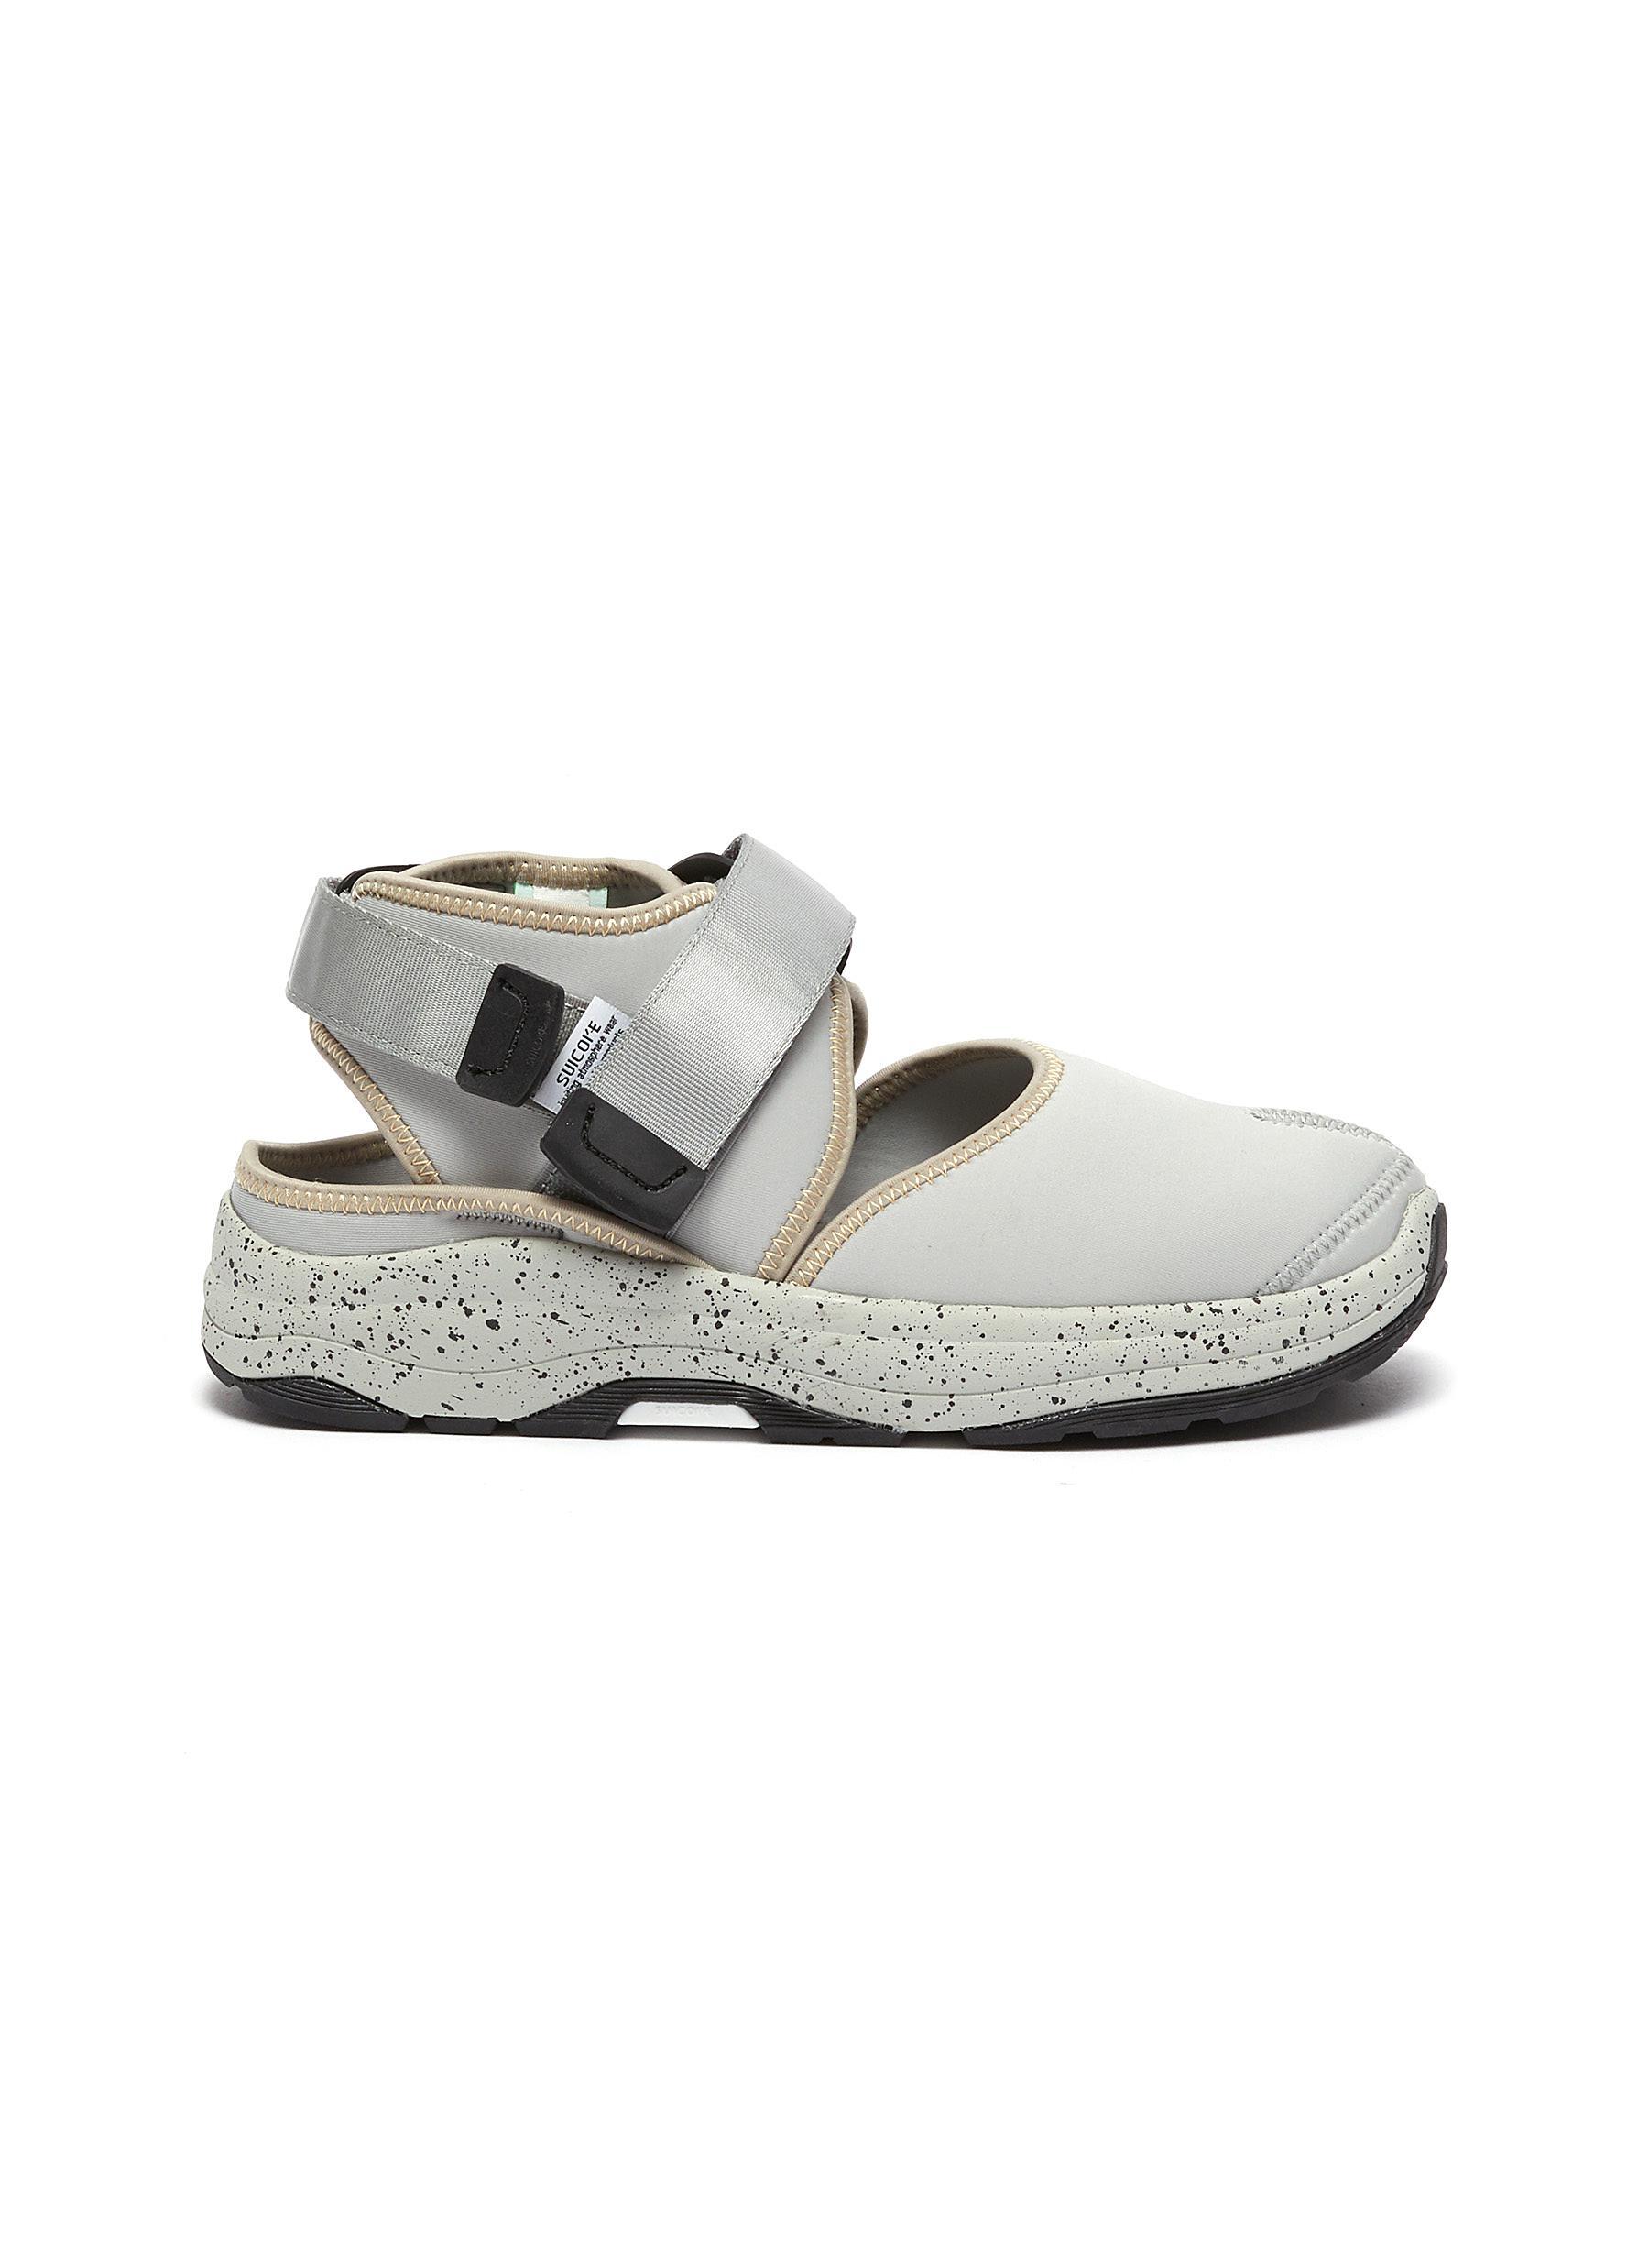 Unbita Split Toe Tabi Chunky Sandals w/ Speckle Sole and Ankle Strap - SUICOKE - Modalova